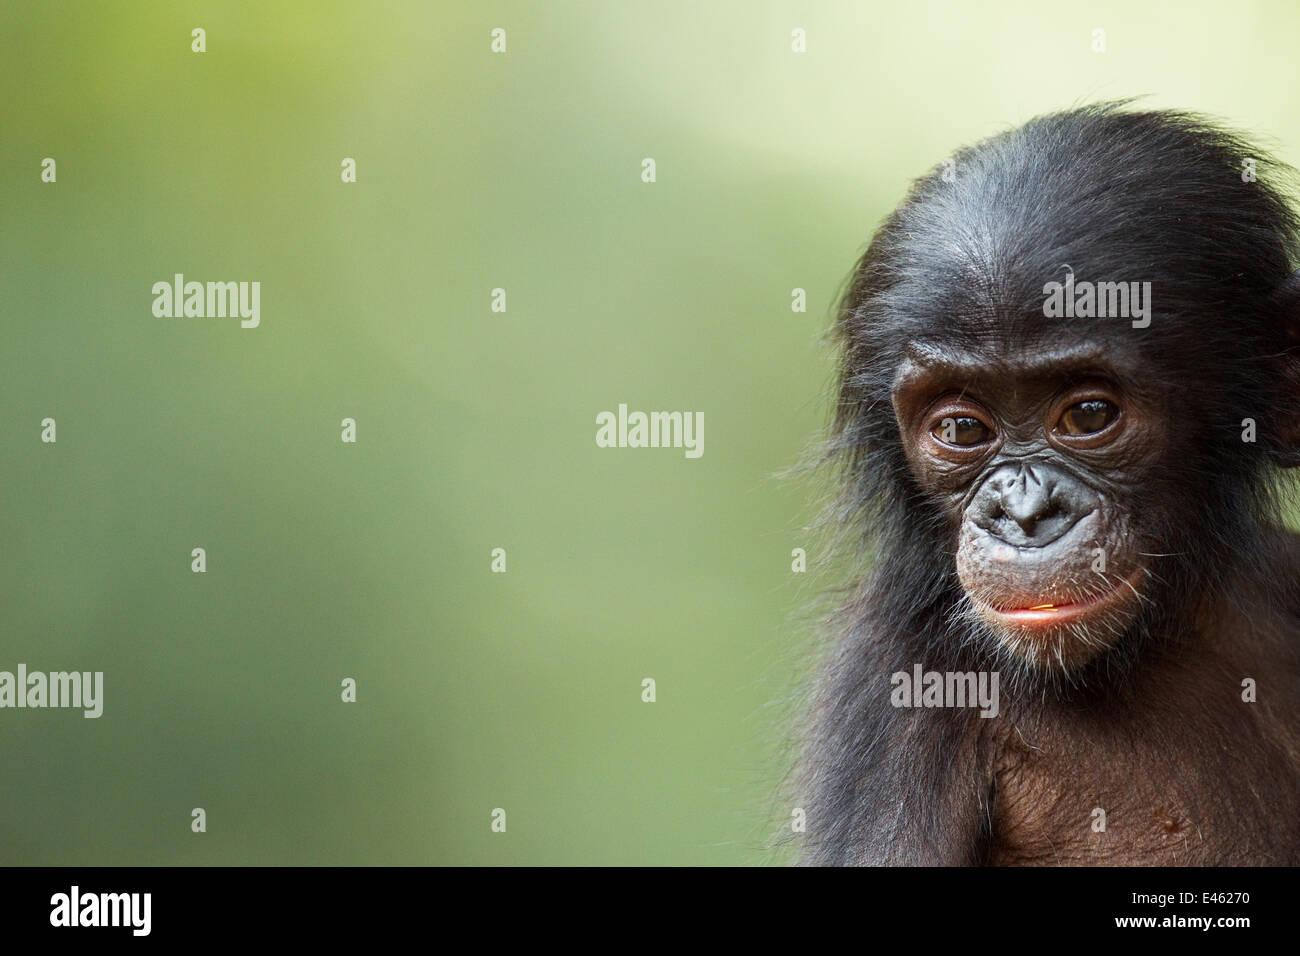 Bonobo (Pan paniscus) male baby 'Ombwe' aged 1 year, portrait, Lola Ya Bonobo Sanctuary, Democratic Republic - Stock Image